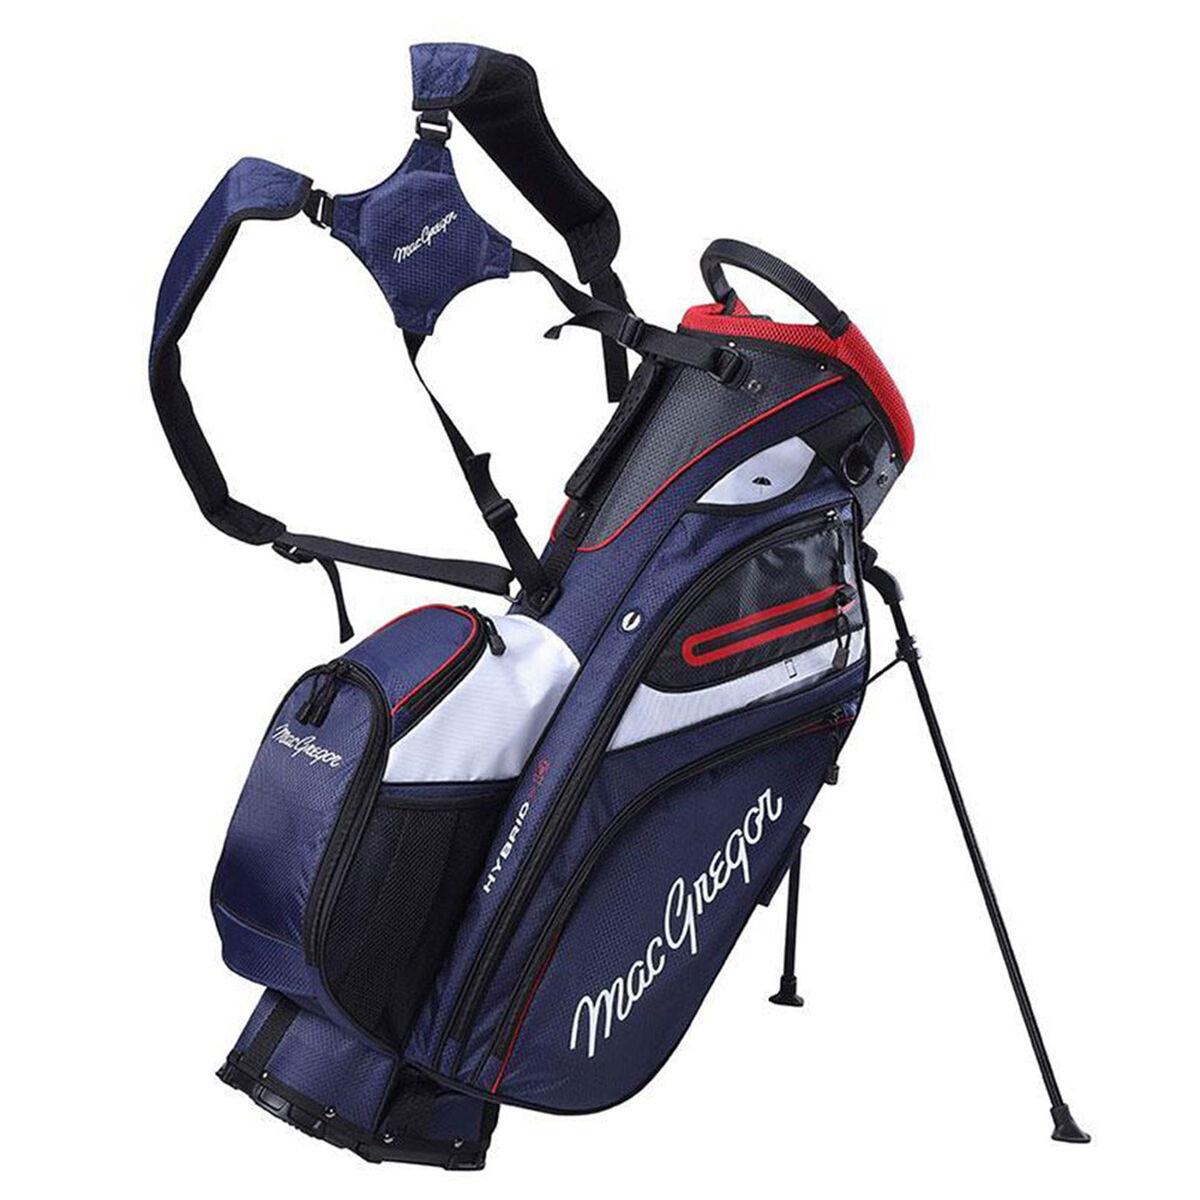 MacGregor Hybrid 14 Golf Stand Bag, Navy   American Golf